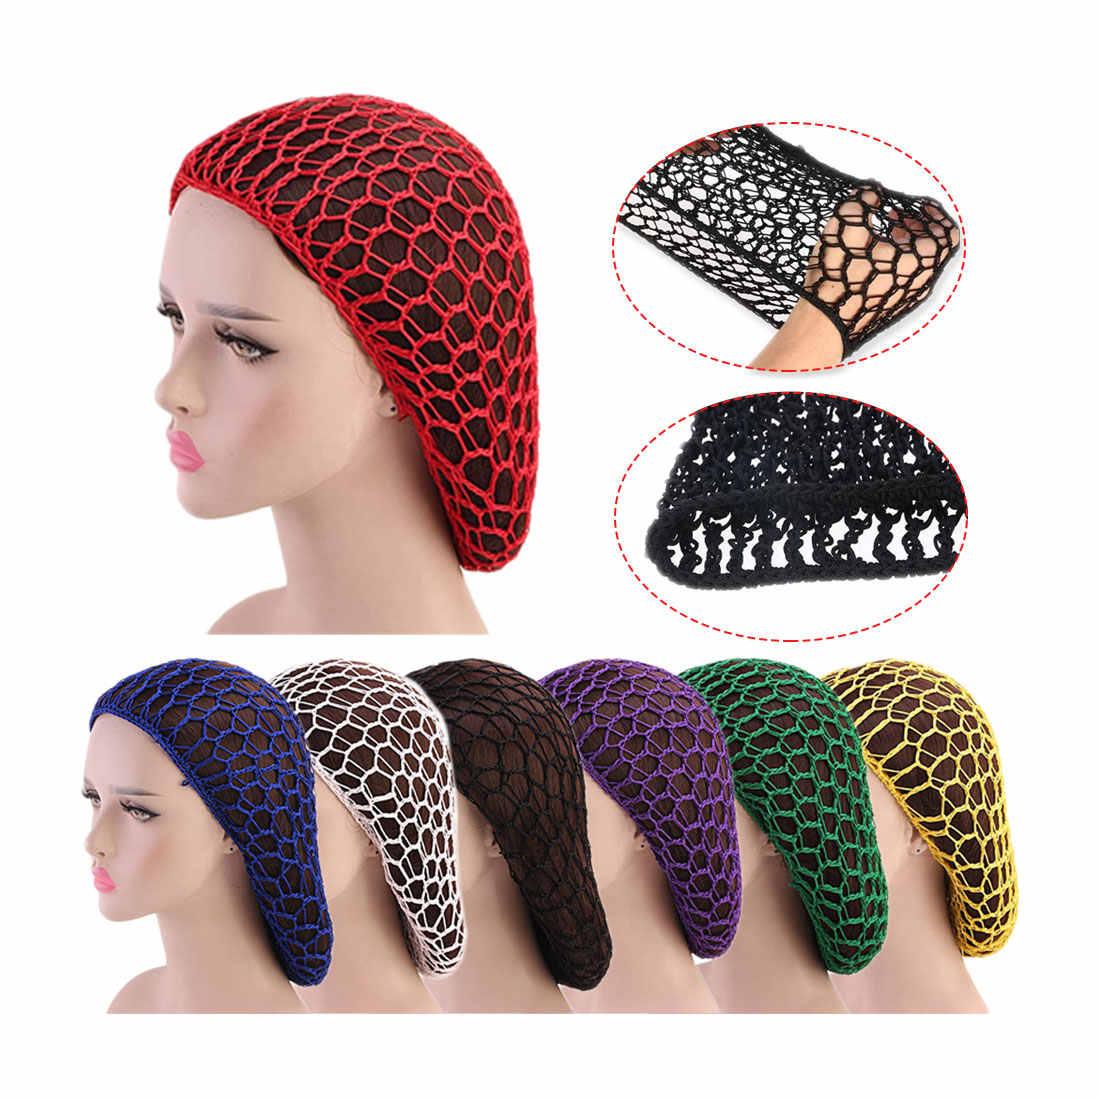 Purple Hair Net Bands Soft Elastic Lines Snood Cover Rayon Net Hair Net Hair Accessories  Sleeping Crochet Hairnet